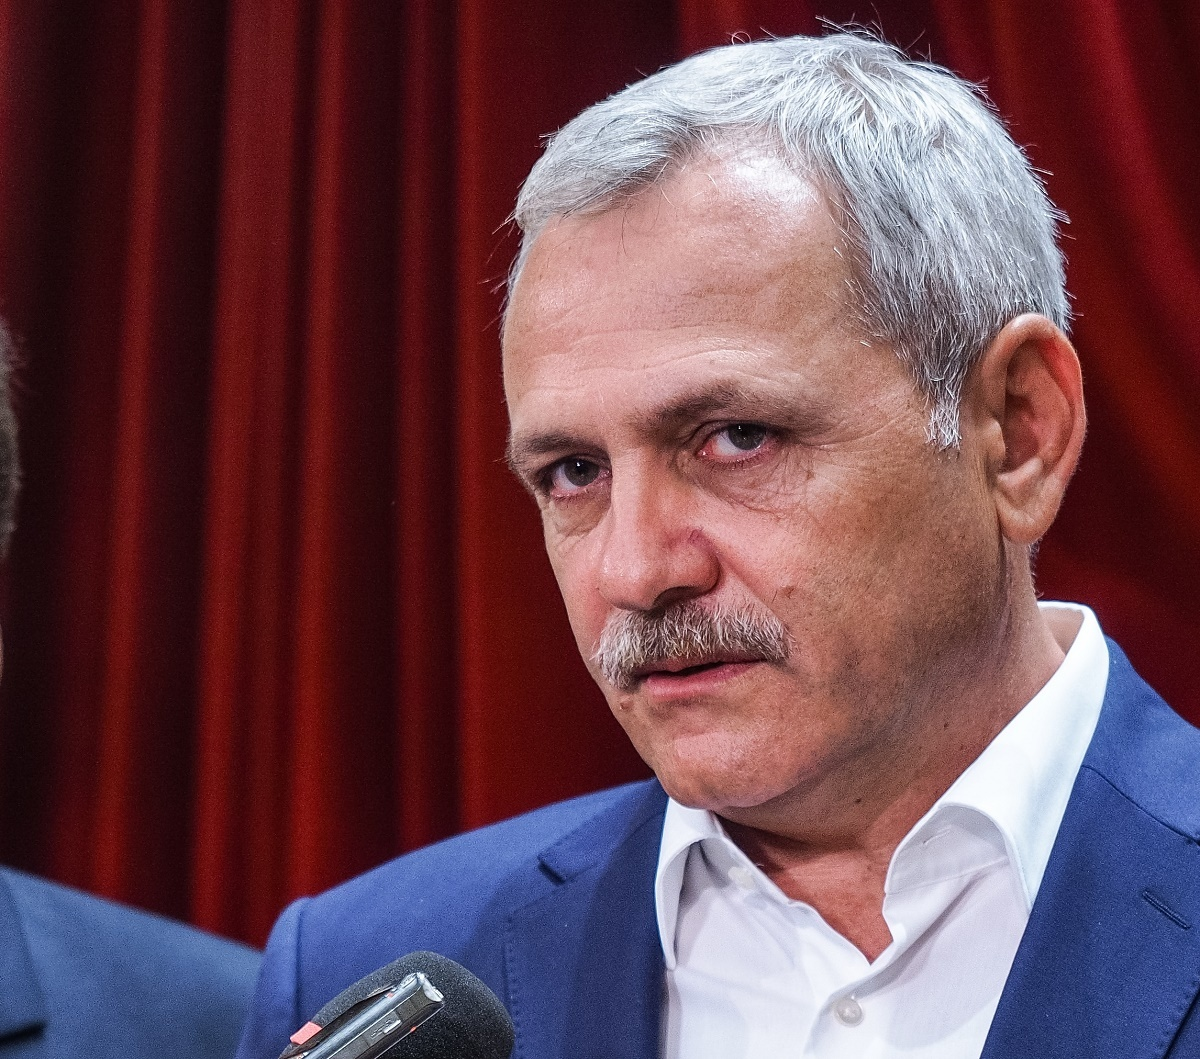 Leader of the Romanian Social Democrat Party Liviu Dragnea ...  |Liviu Dragnea